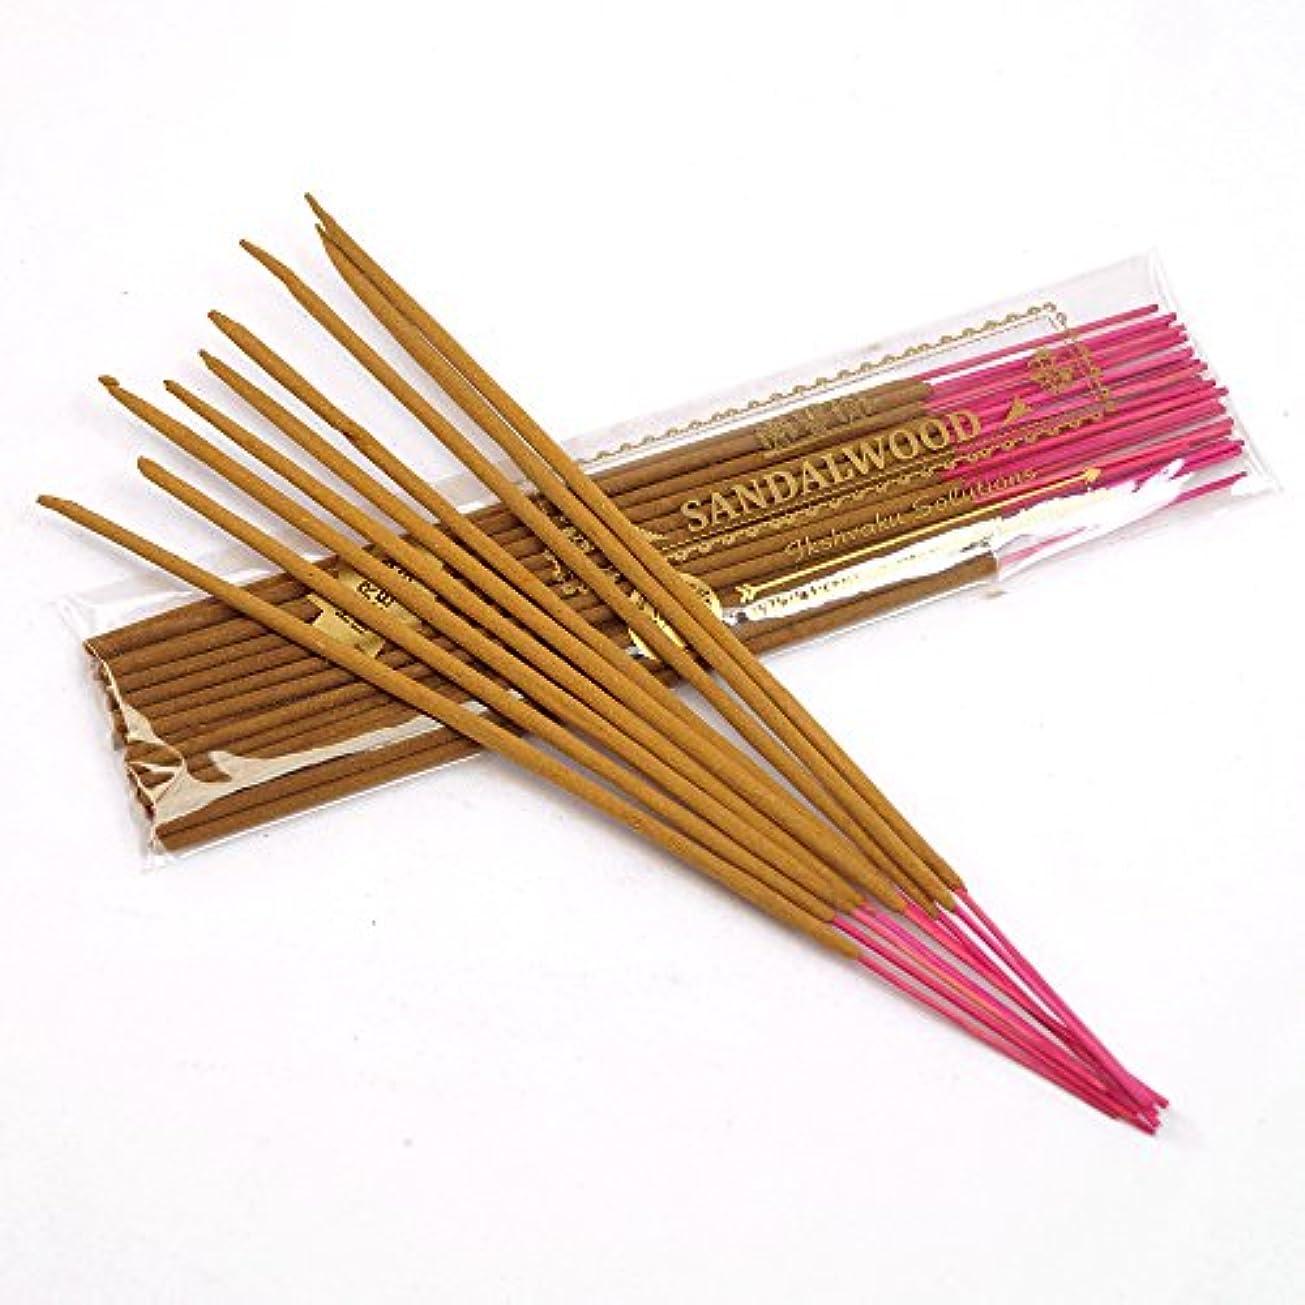 最悪電圧悲惨Sandalwood Incense Sticks 250